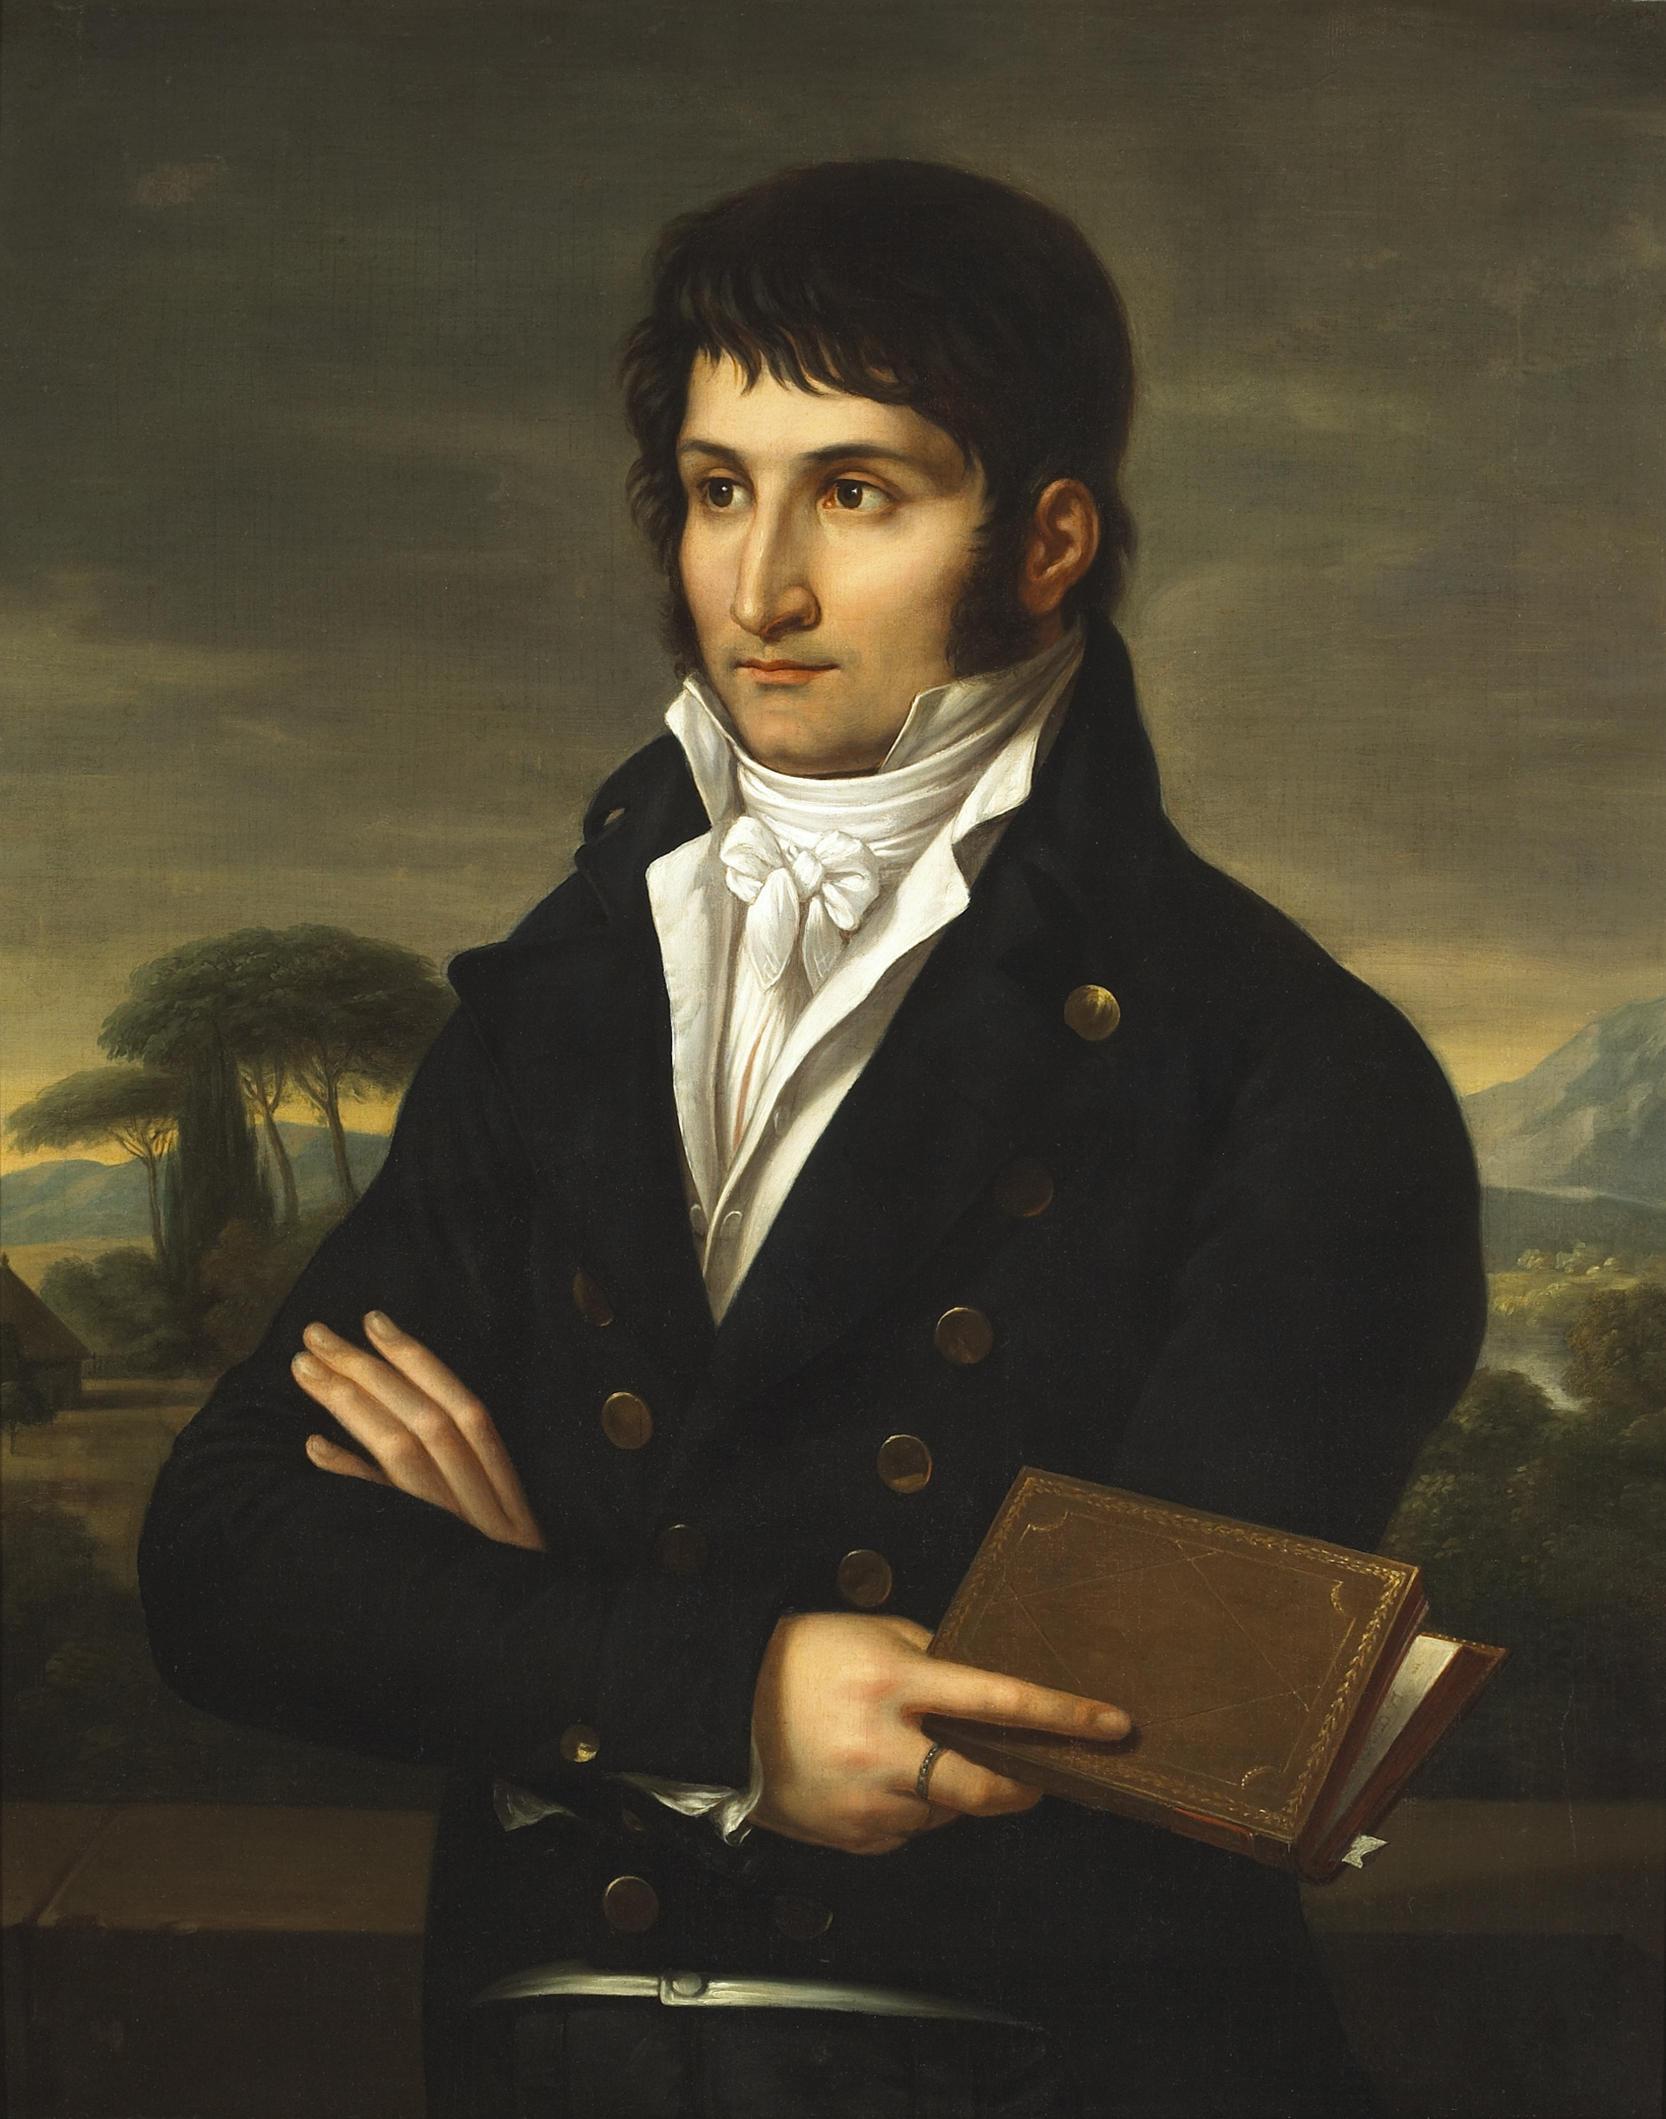 http://upload.wikimedia.org/wikipedia/commons/a/af/Fran%C3%A7ois-Xavier_Fabre_(Studio)_-_Portrait_de_Lucien_Bonaparte.jpg